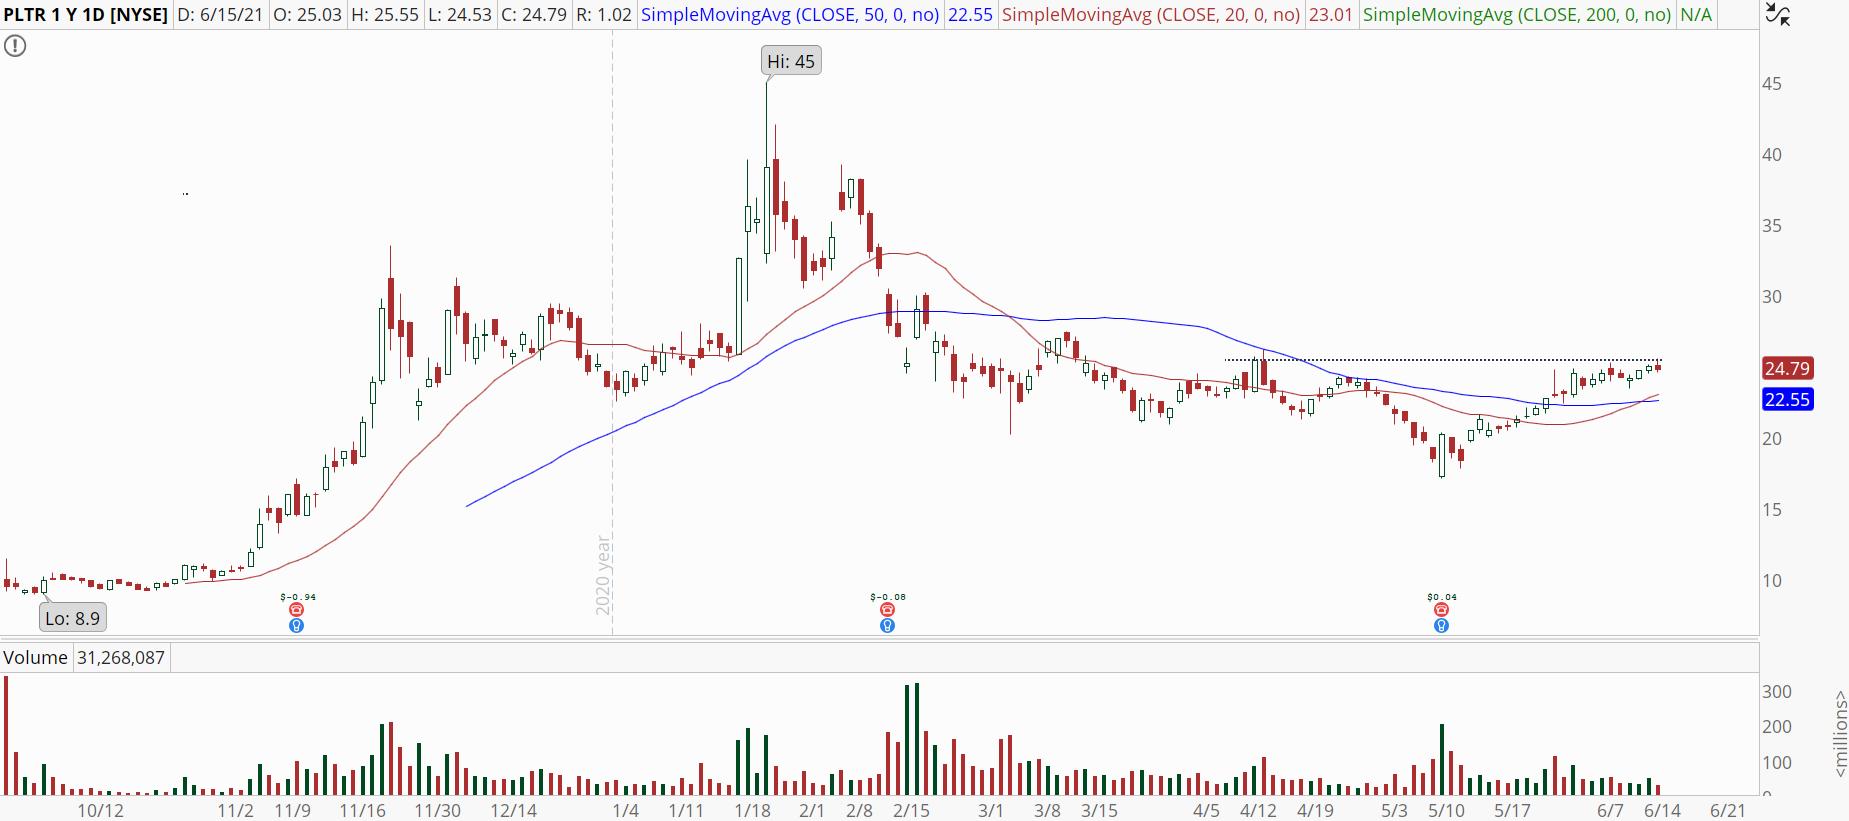 Palantir (PLTR) stock chart with potential bullish breakout